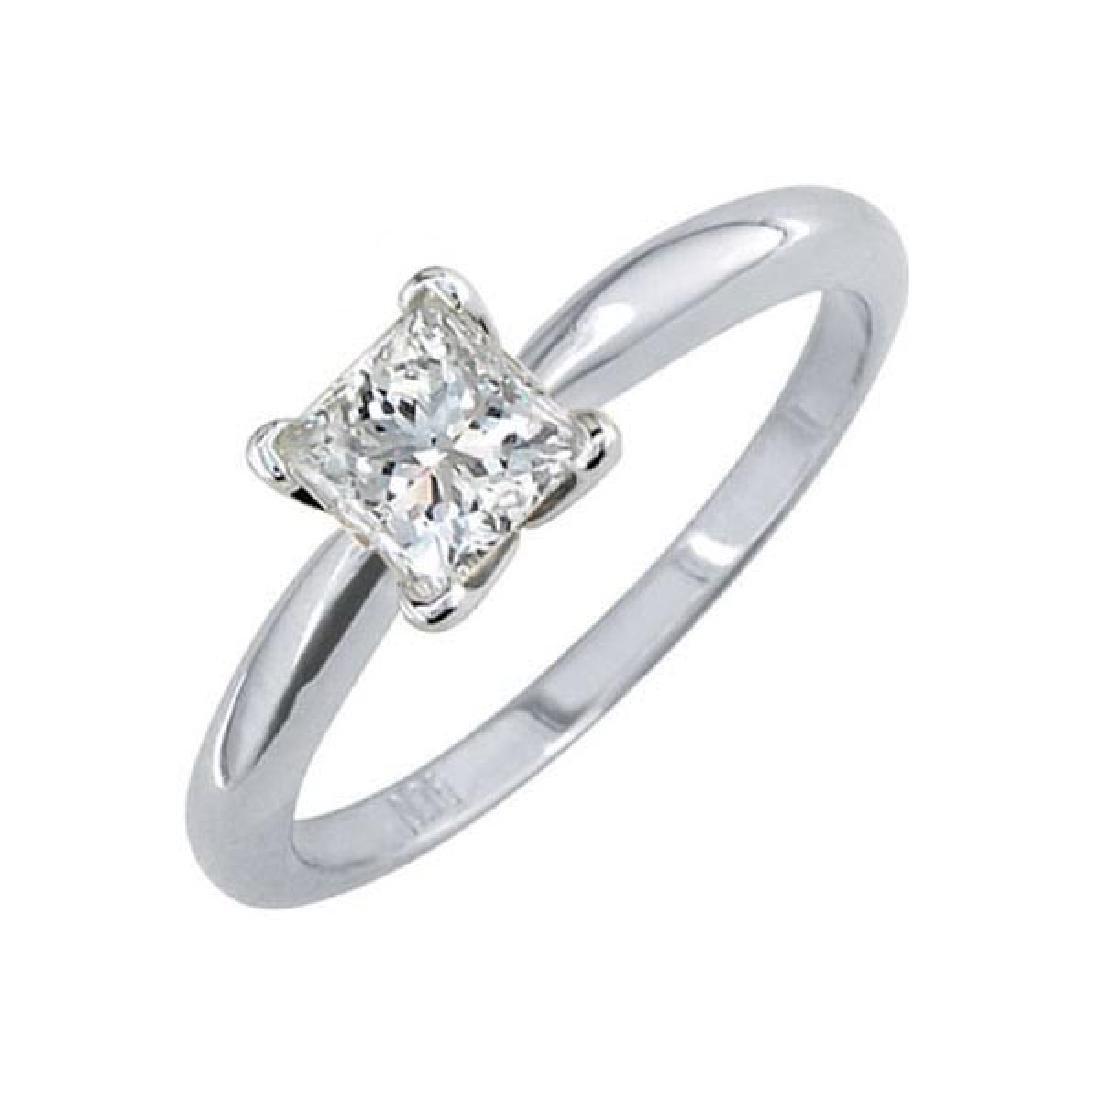 Certified 0.34 CTW Princess Diamond Solitaire 14k Ring